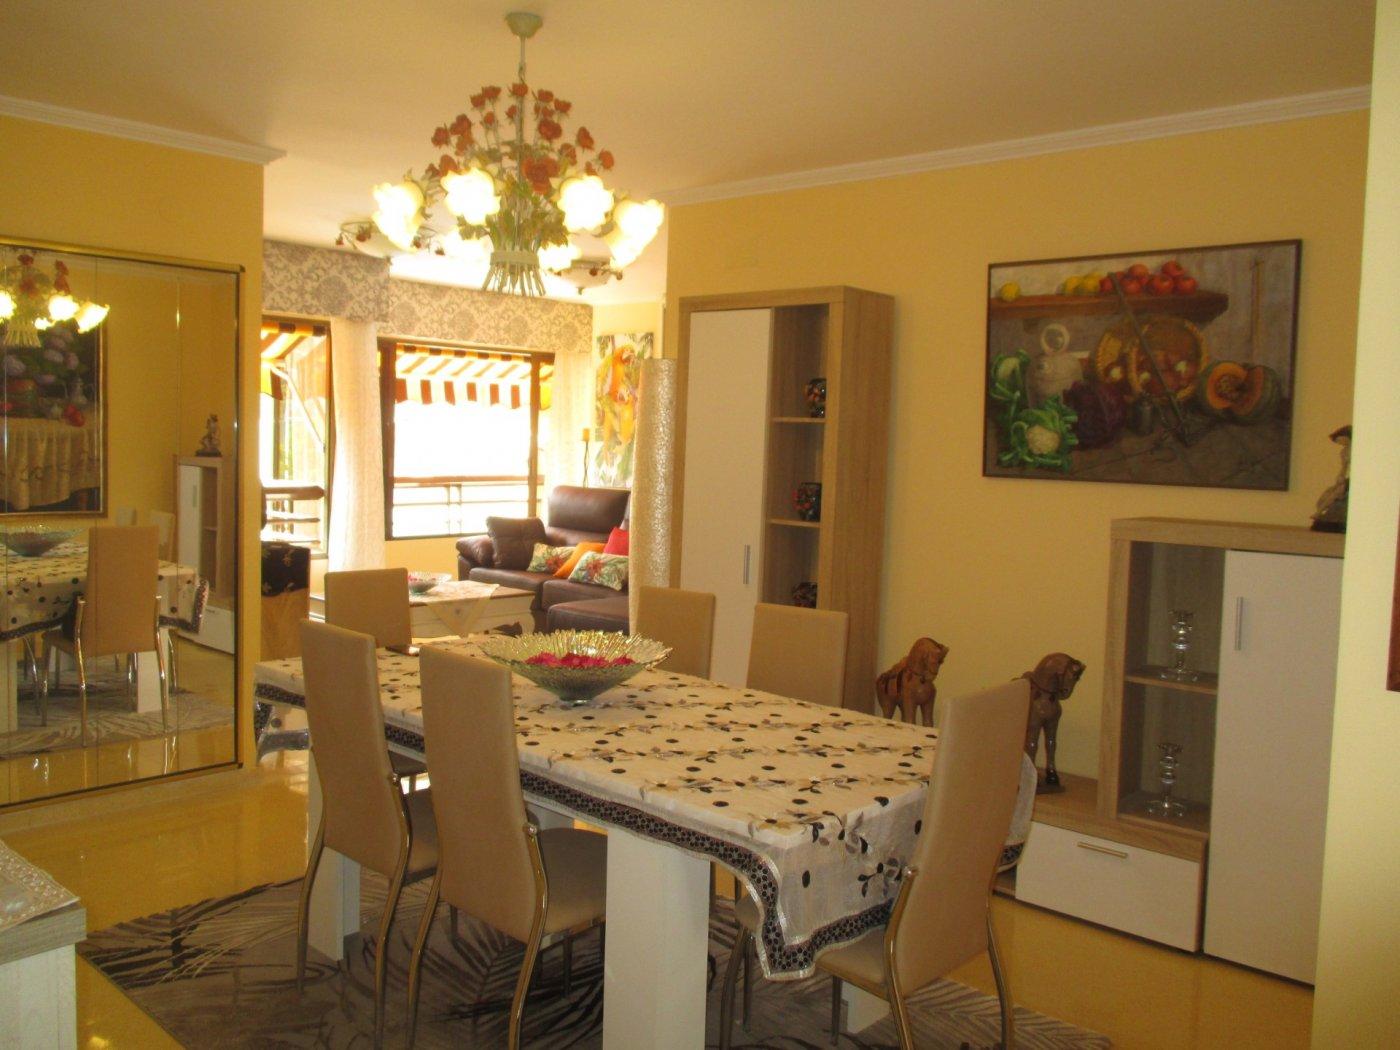 Apartamento en Benidorm zona Cala de Benidorm de 100 m²